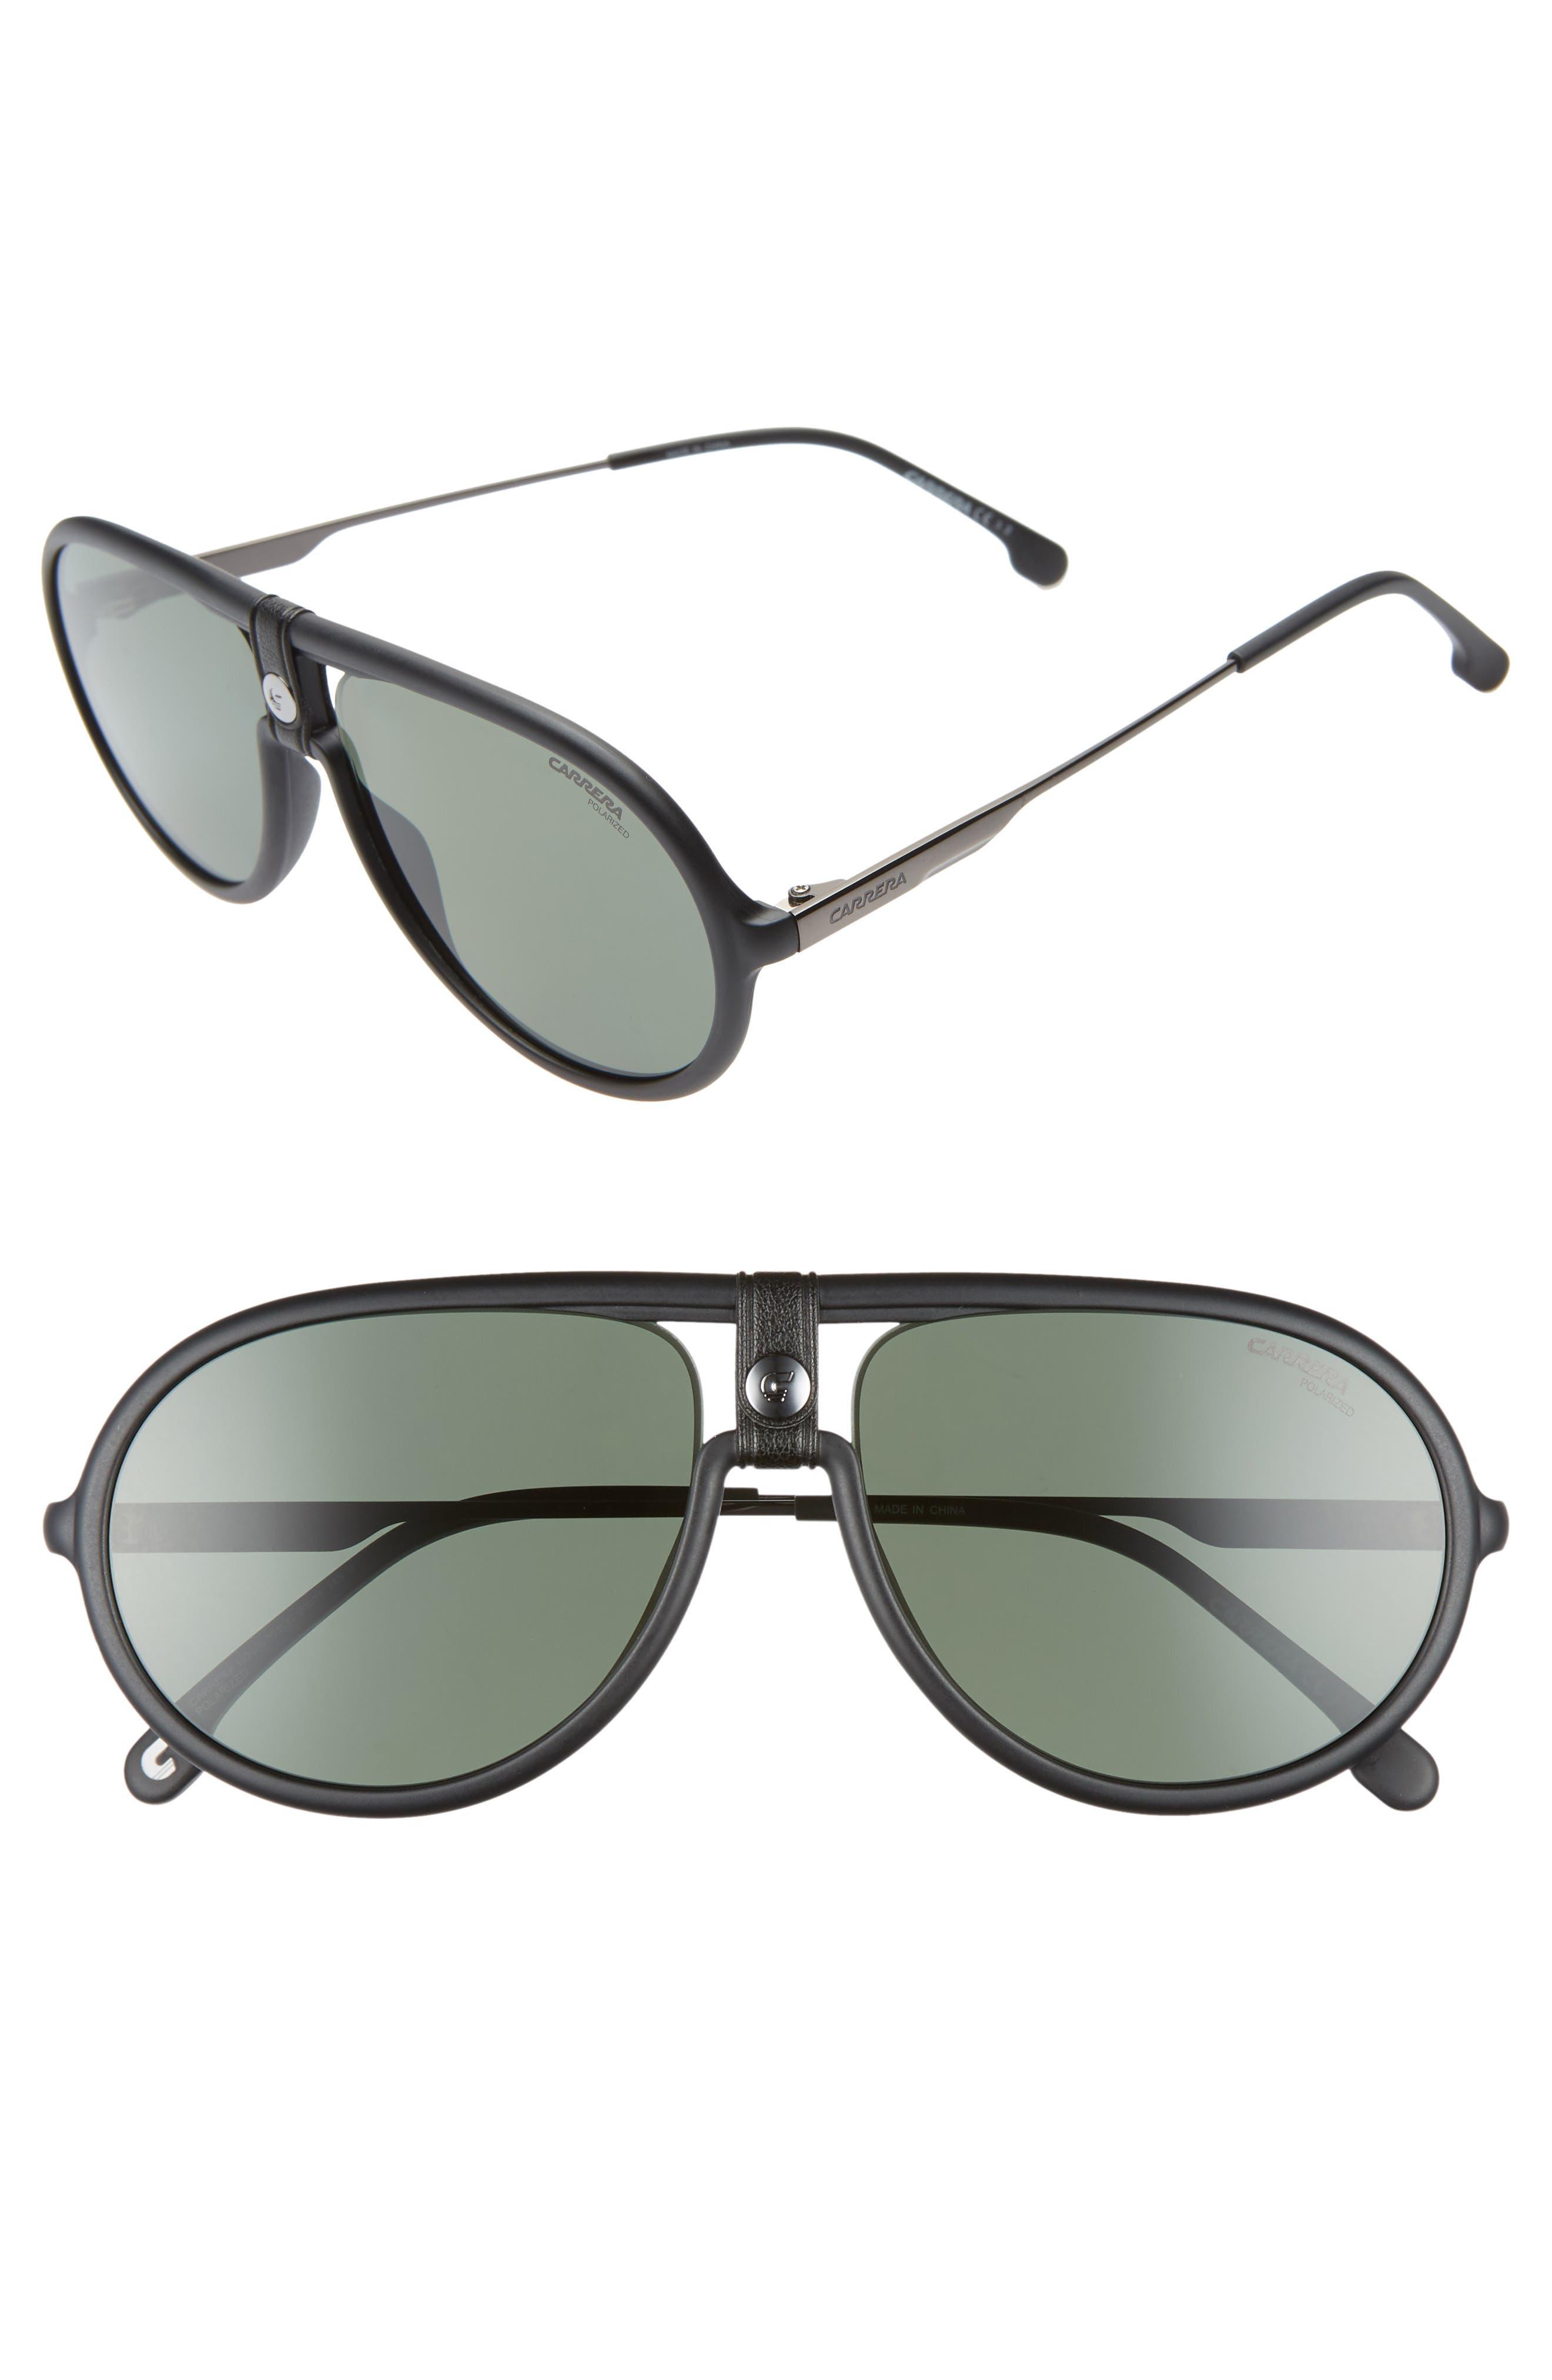 Carrera Eyewear 60Mm Polarized Aviator Sunglasses - Matte Black